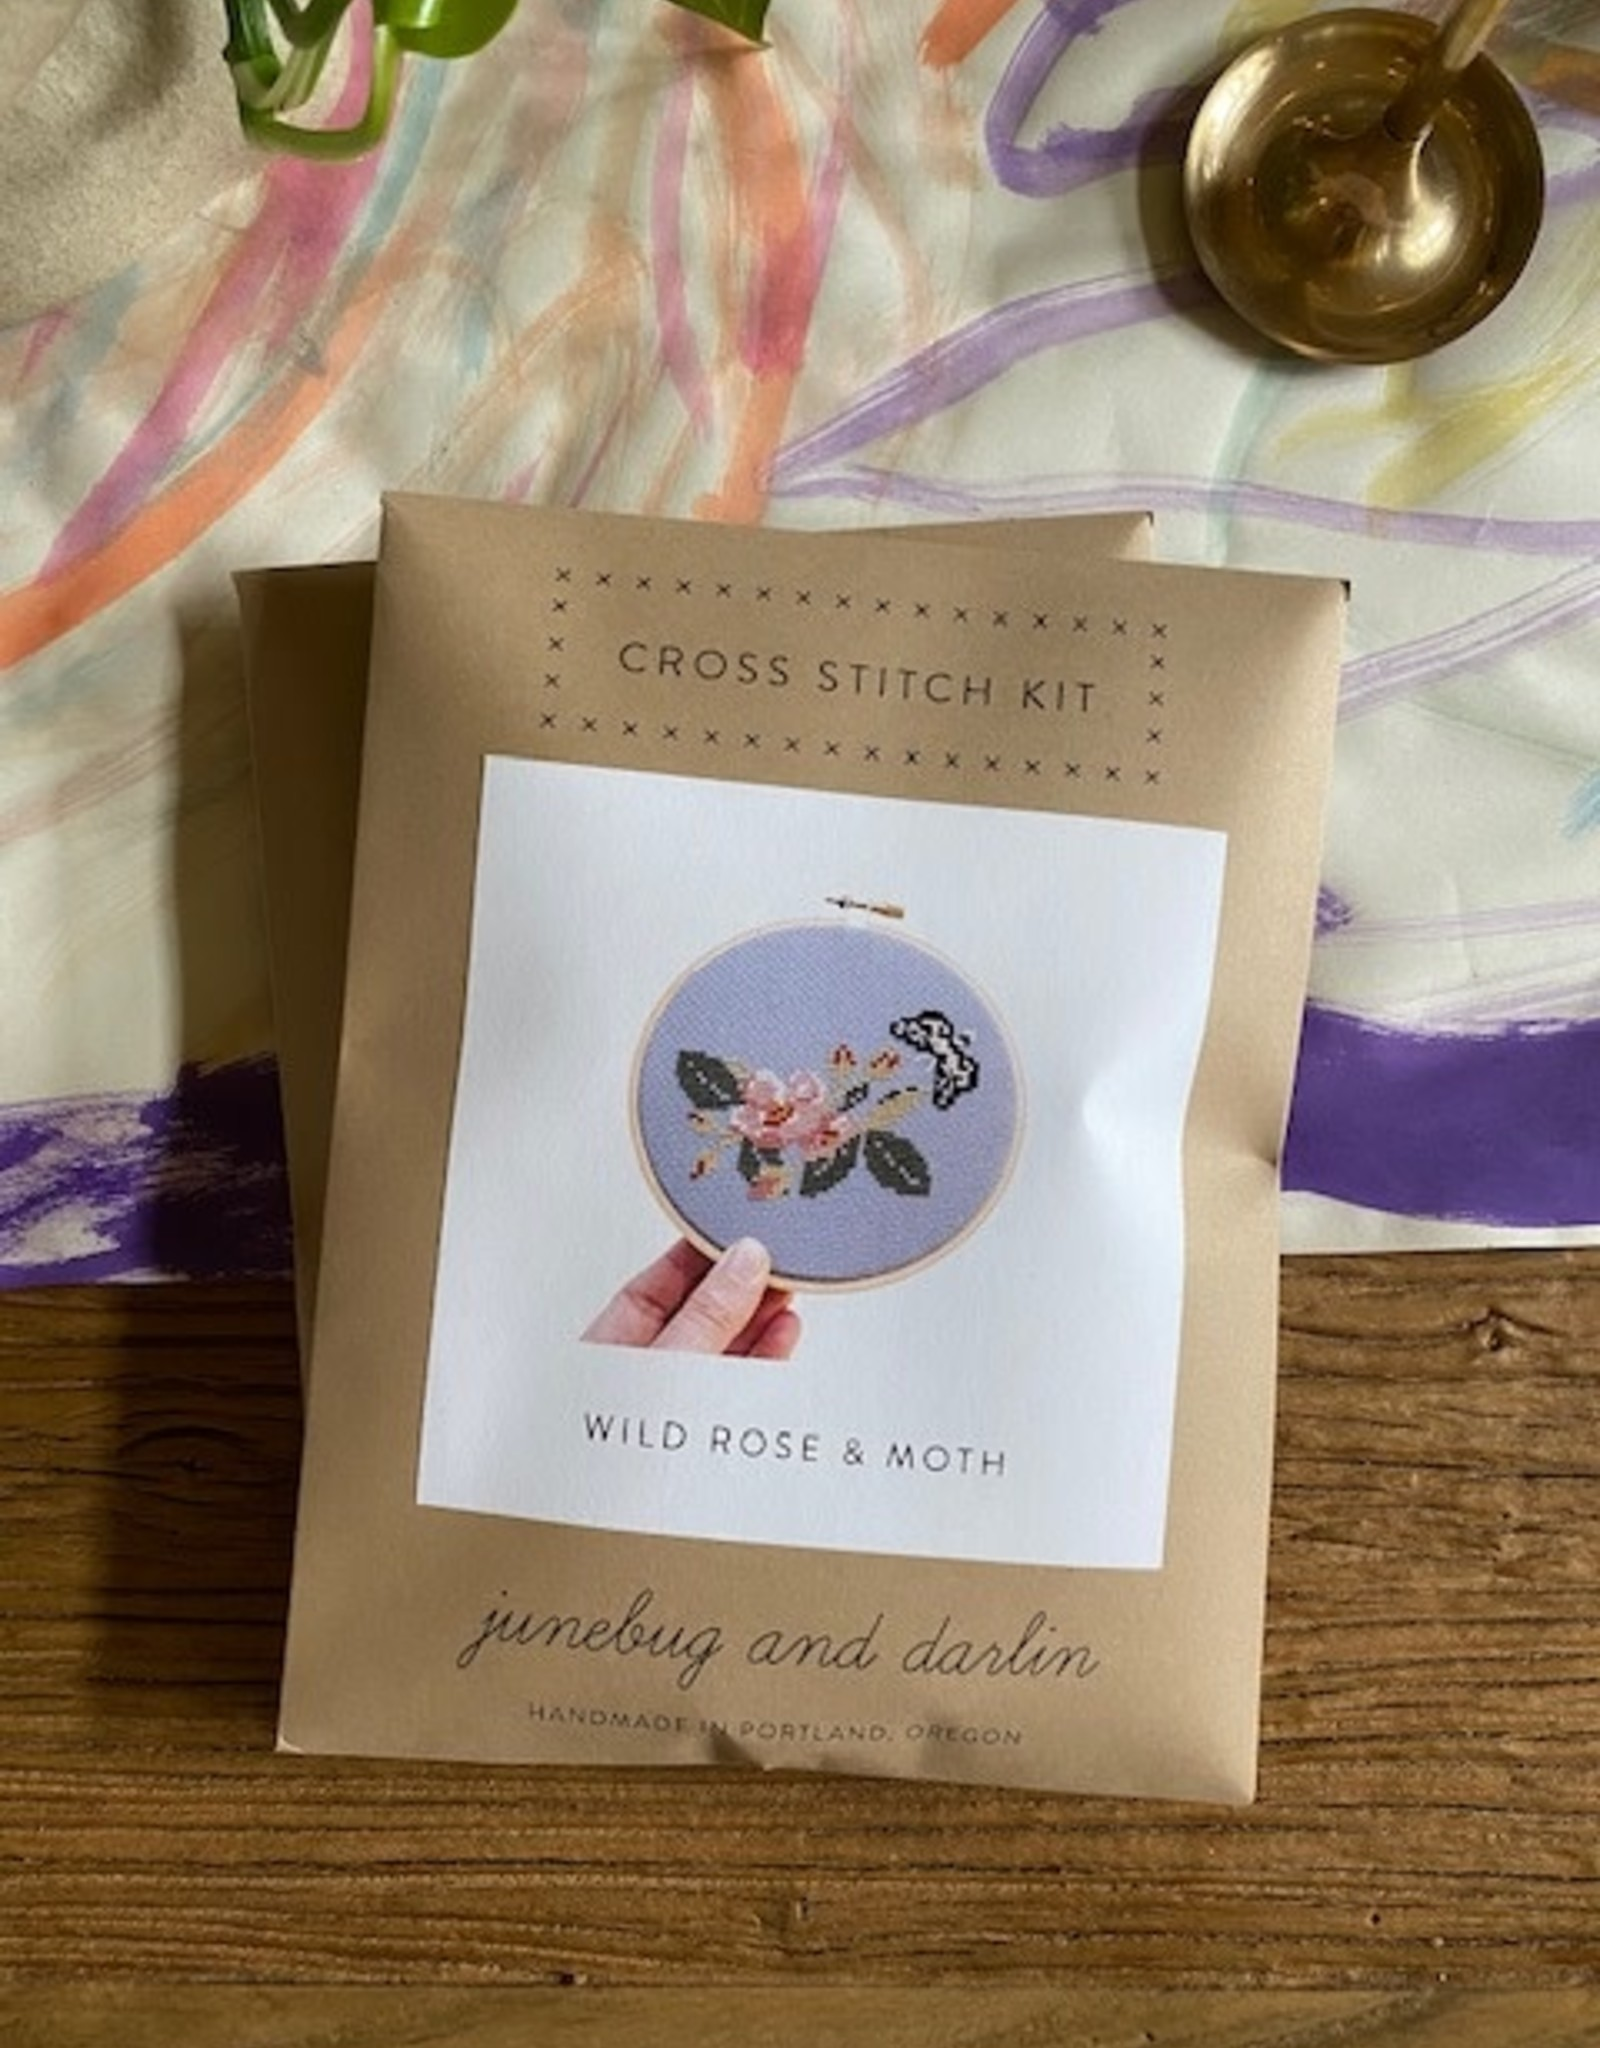 Junebug and Darlin Wild Rose and Moth Kit